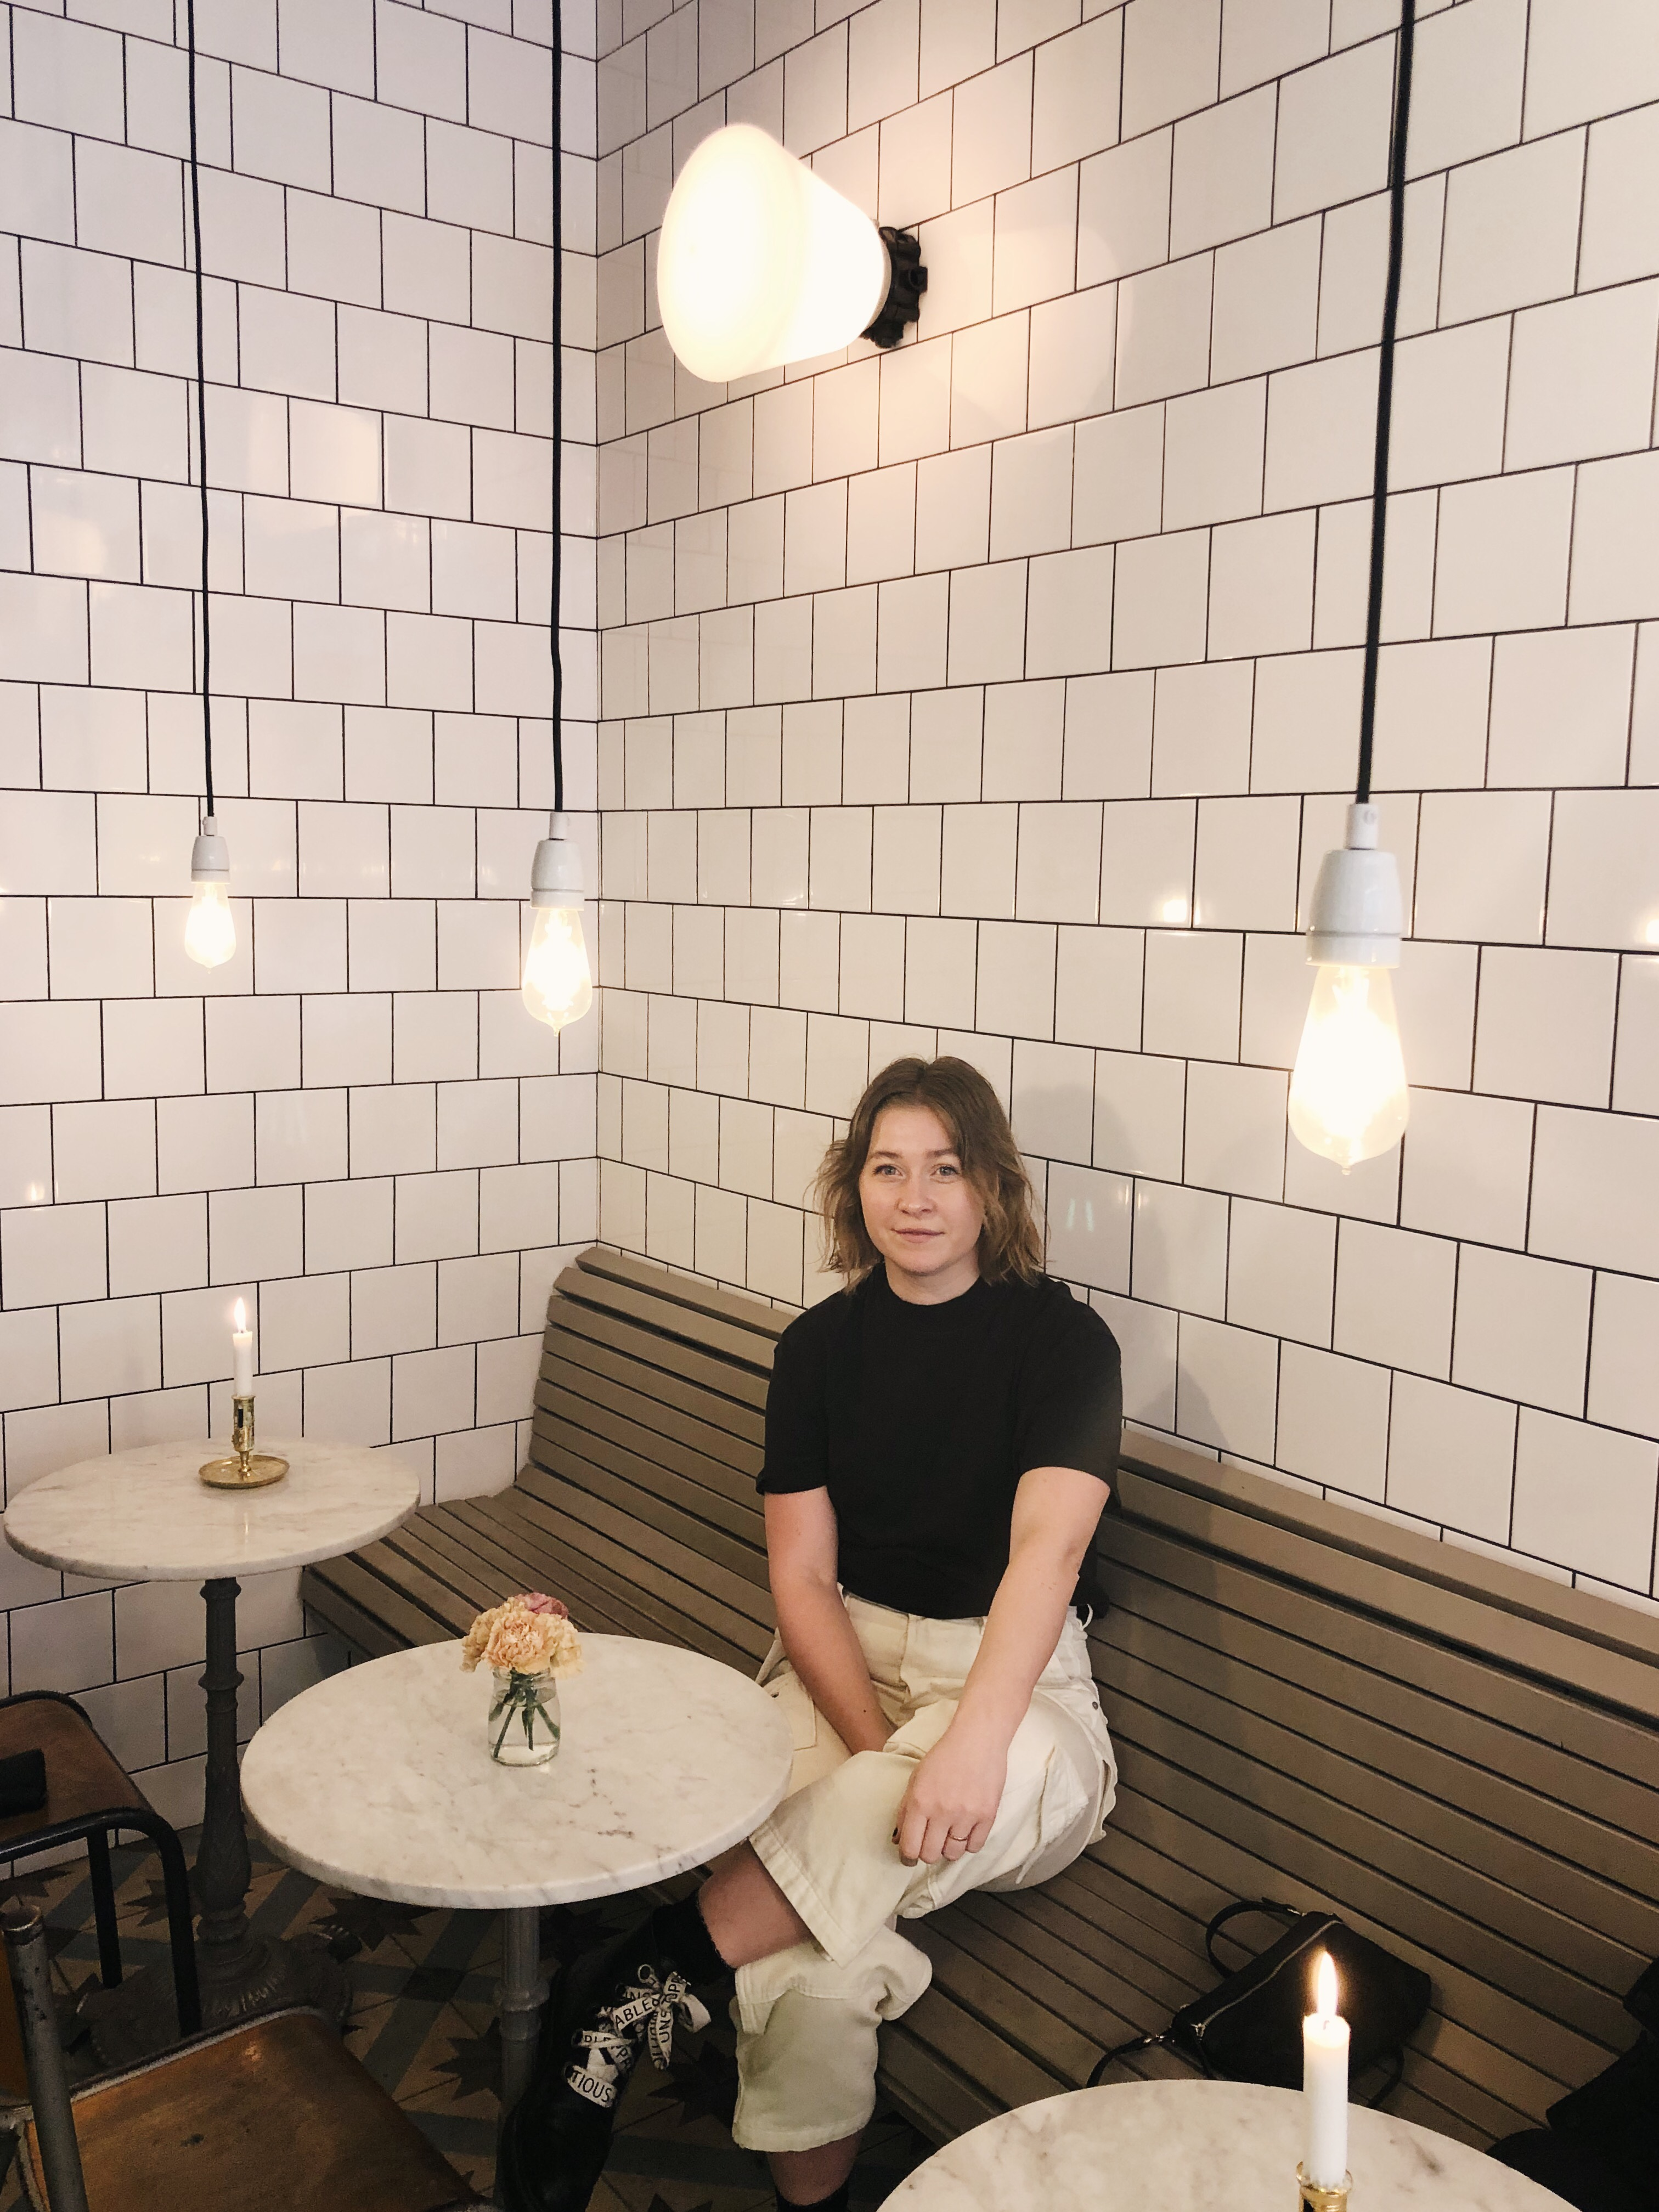 En förmiddag i Stockholm Rebecca Centrén